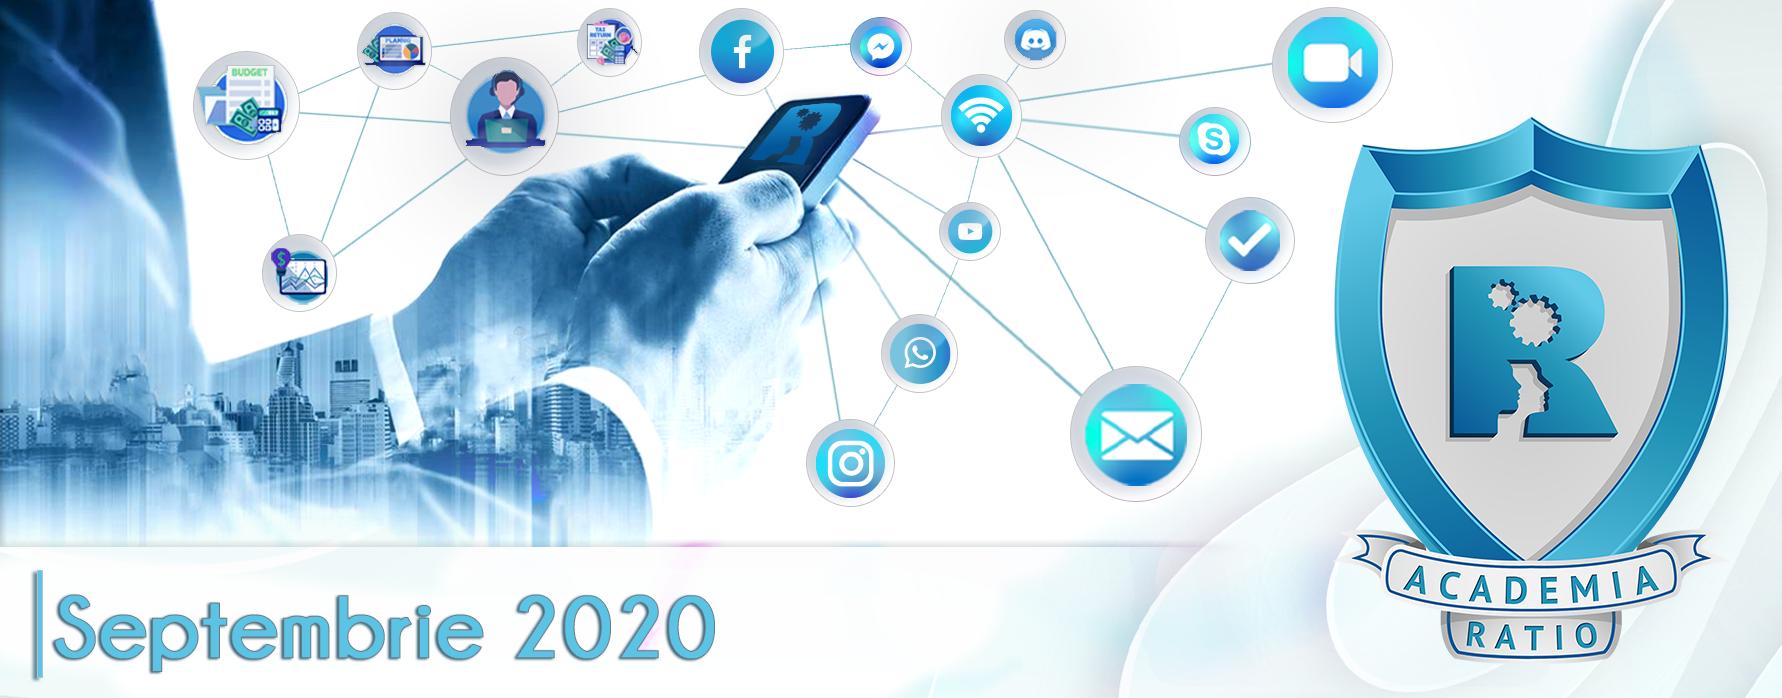 Academia RATIO 2020